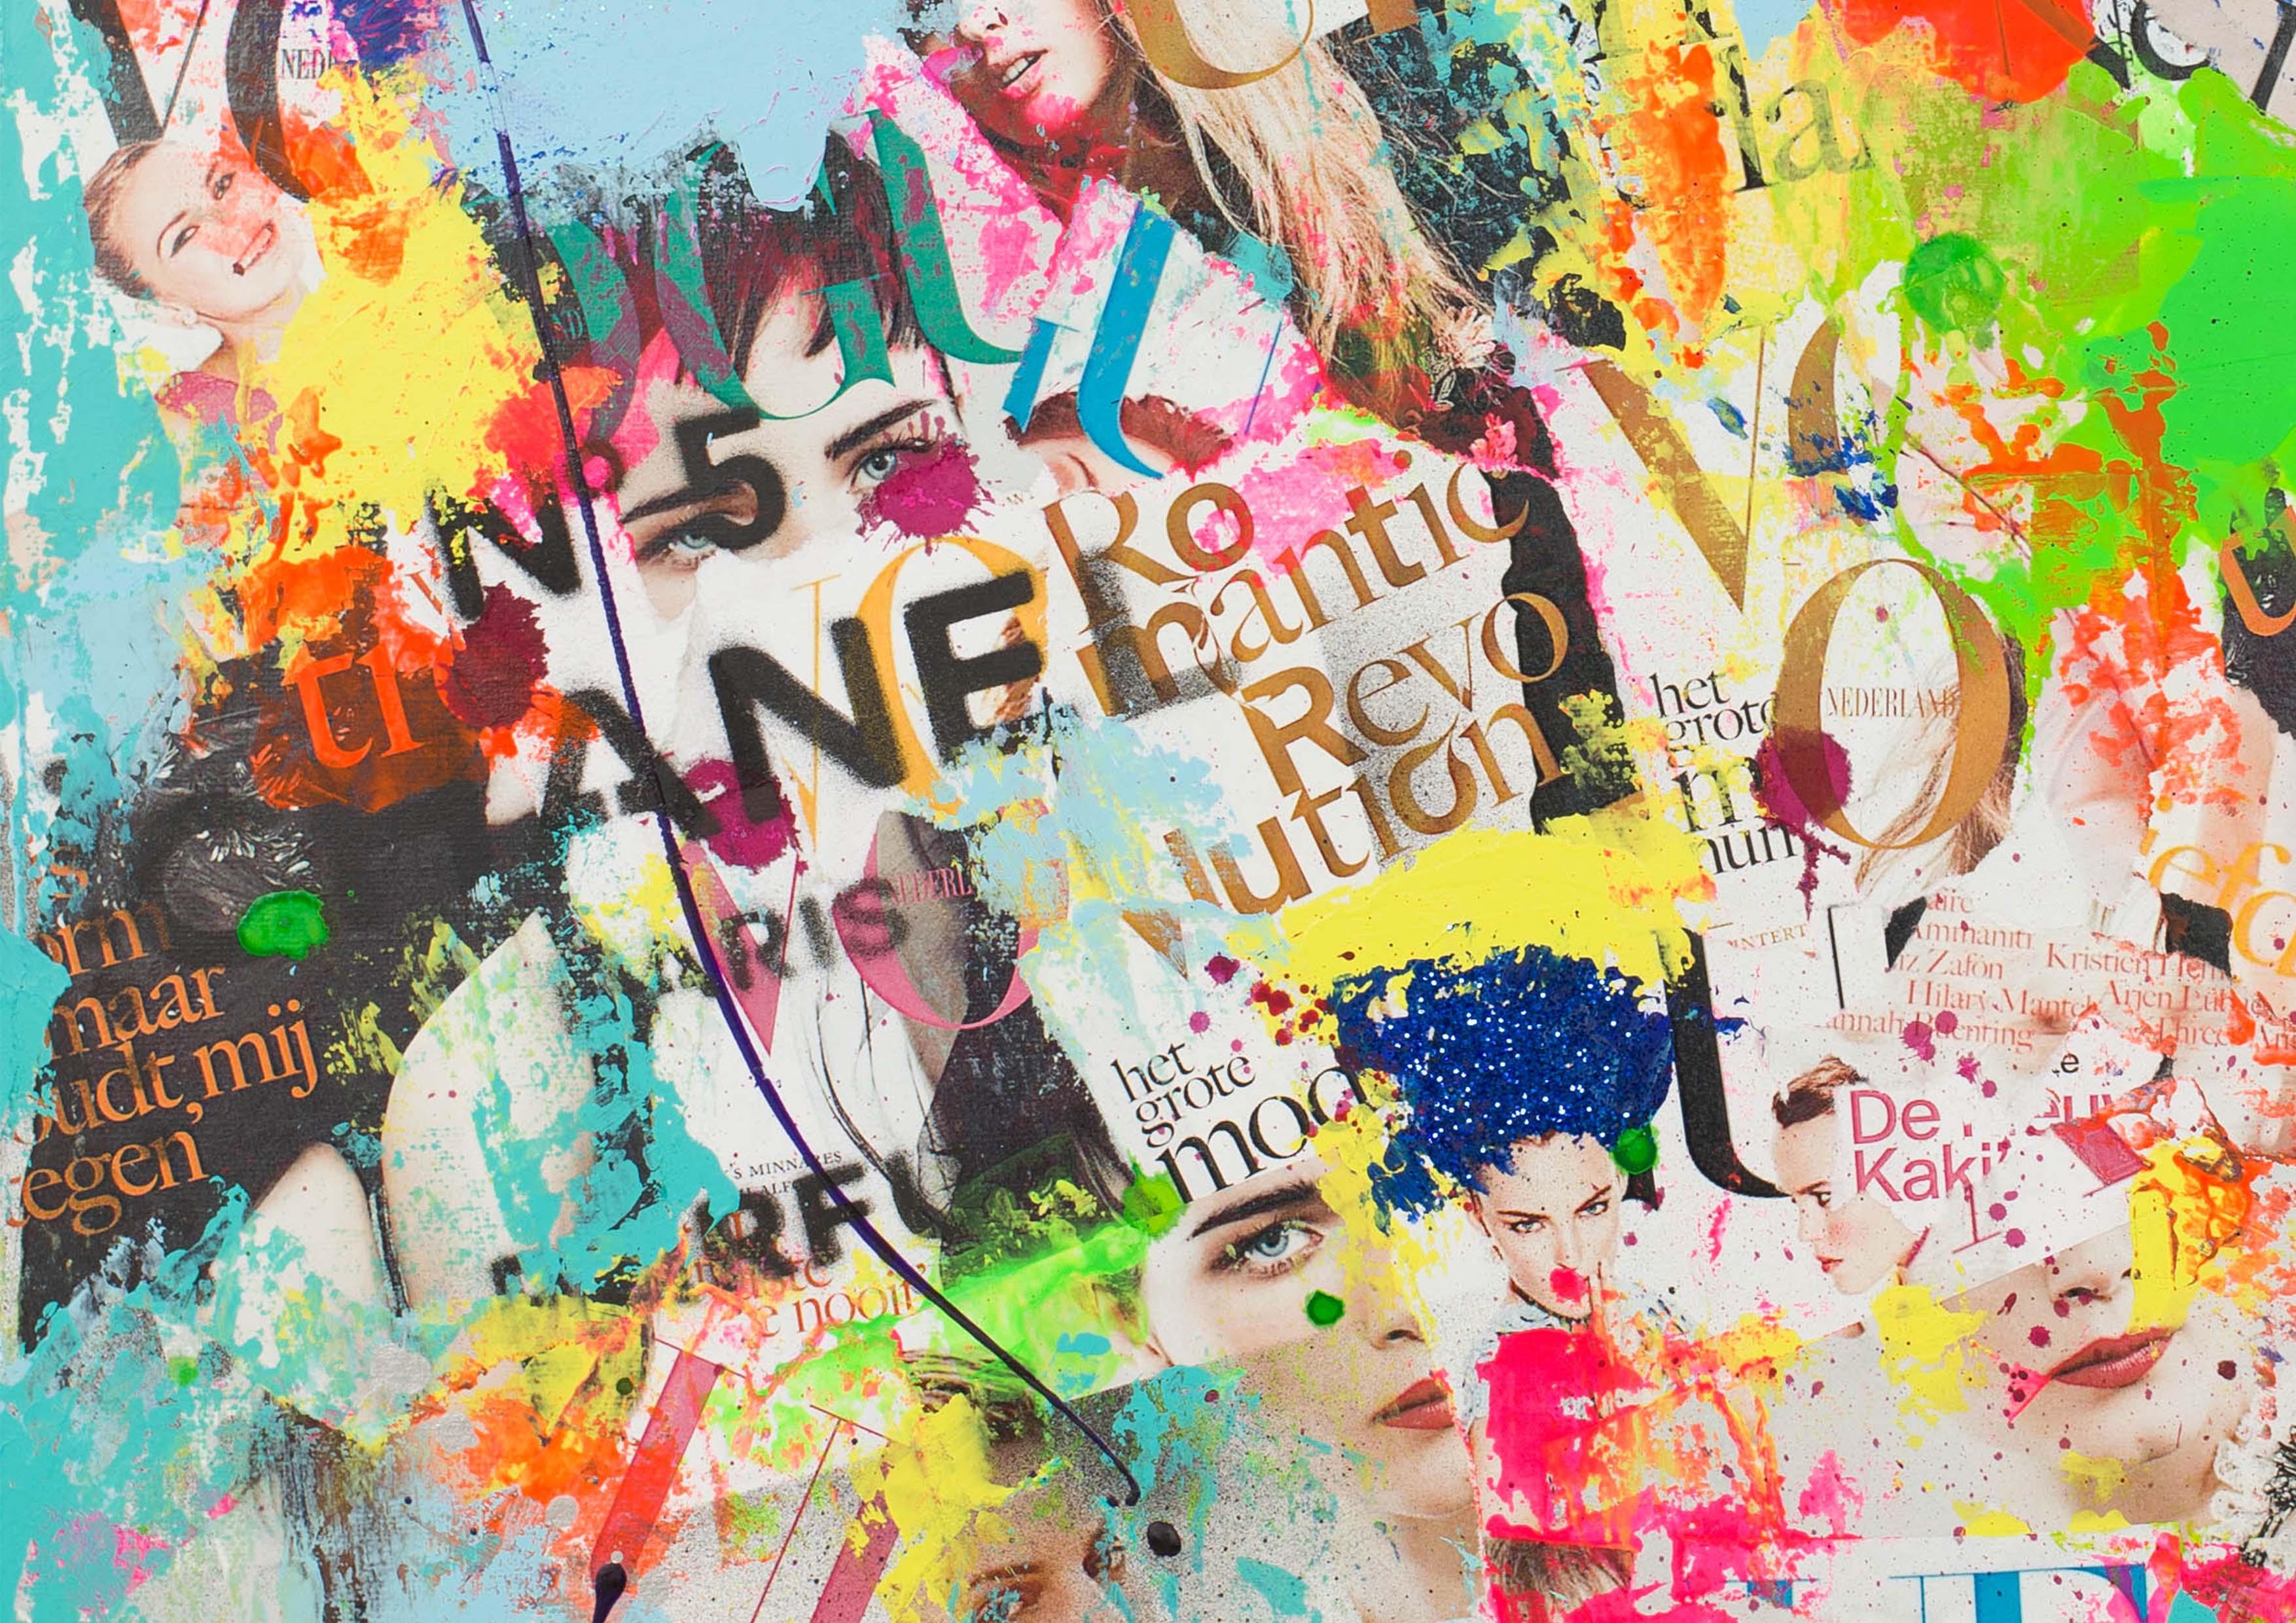 ART_MIXED-MEDIA_NEONIC_REVOLUTION_CANVAS_DETAIL_3